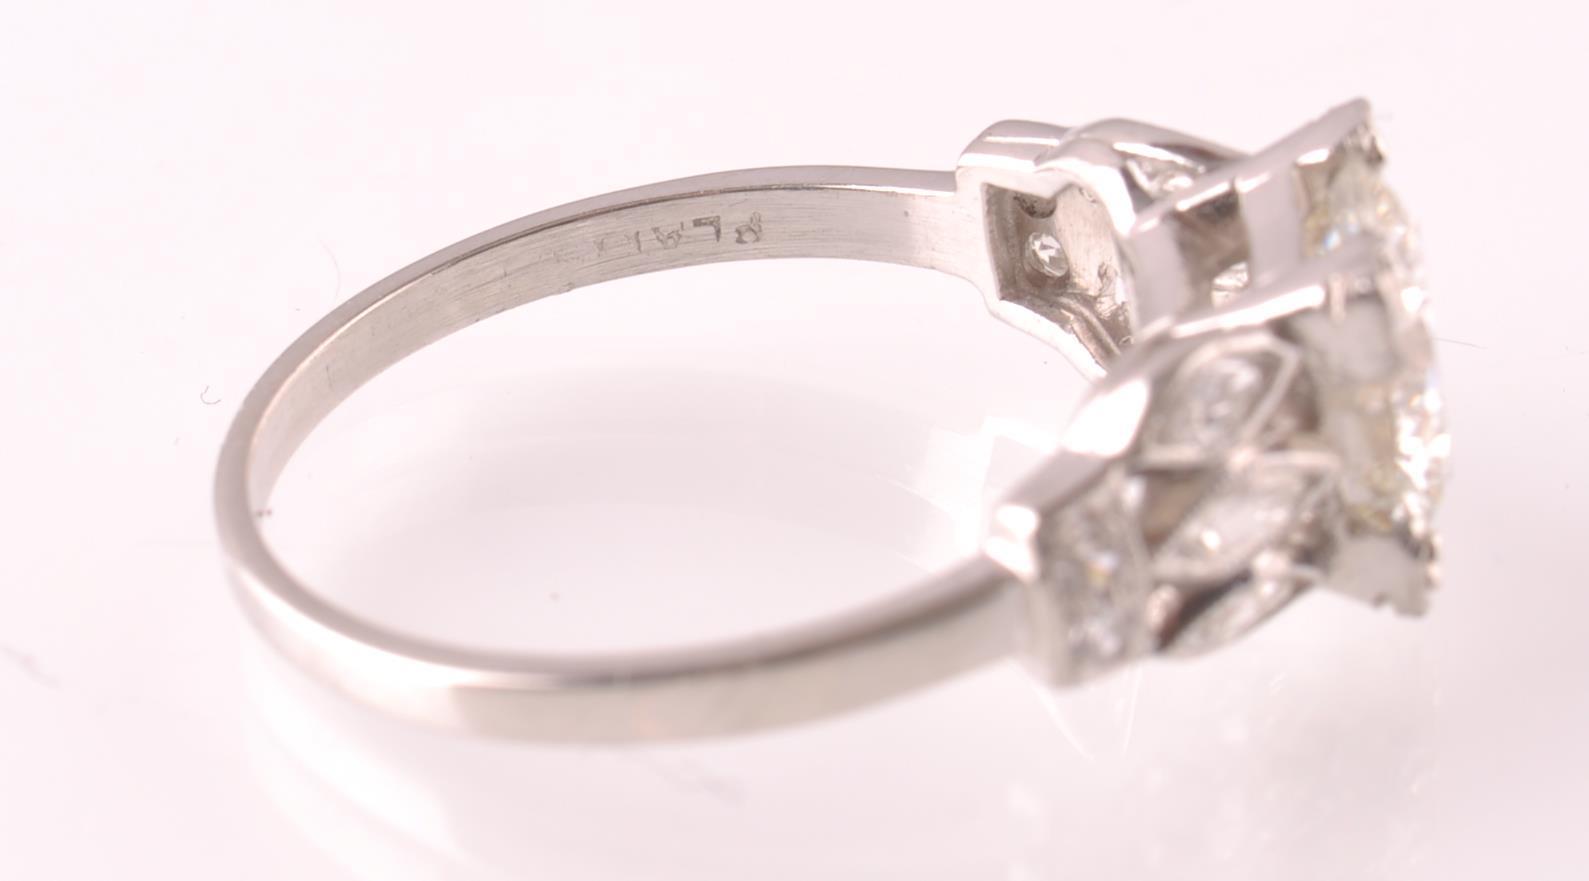 Lot 34 - ART DECO PLATINUM AND DIAMOND SOLITAIRE 2CT RING